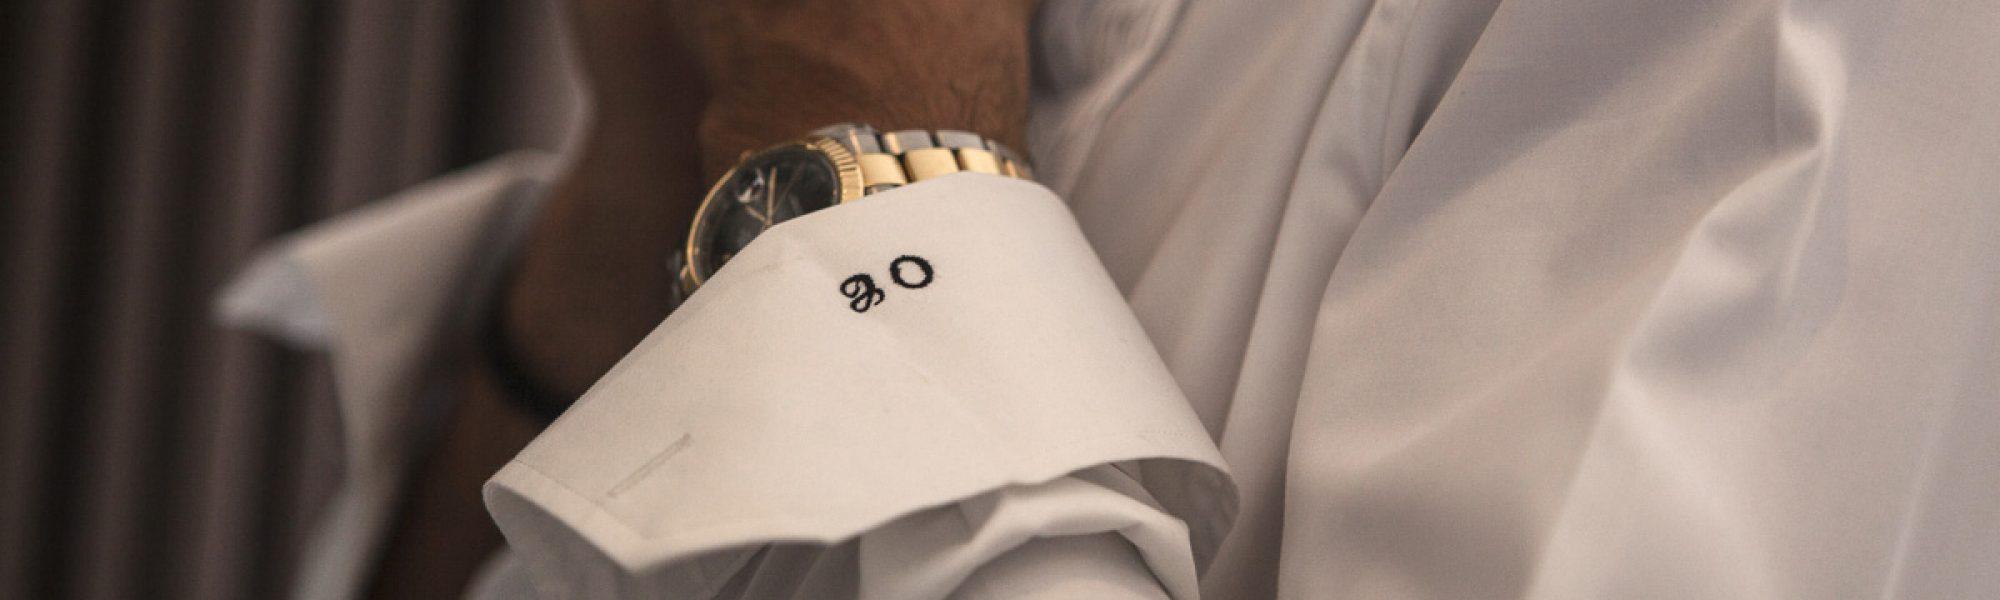 Groom's cuff monogram